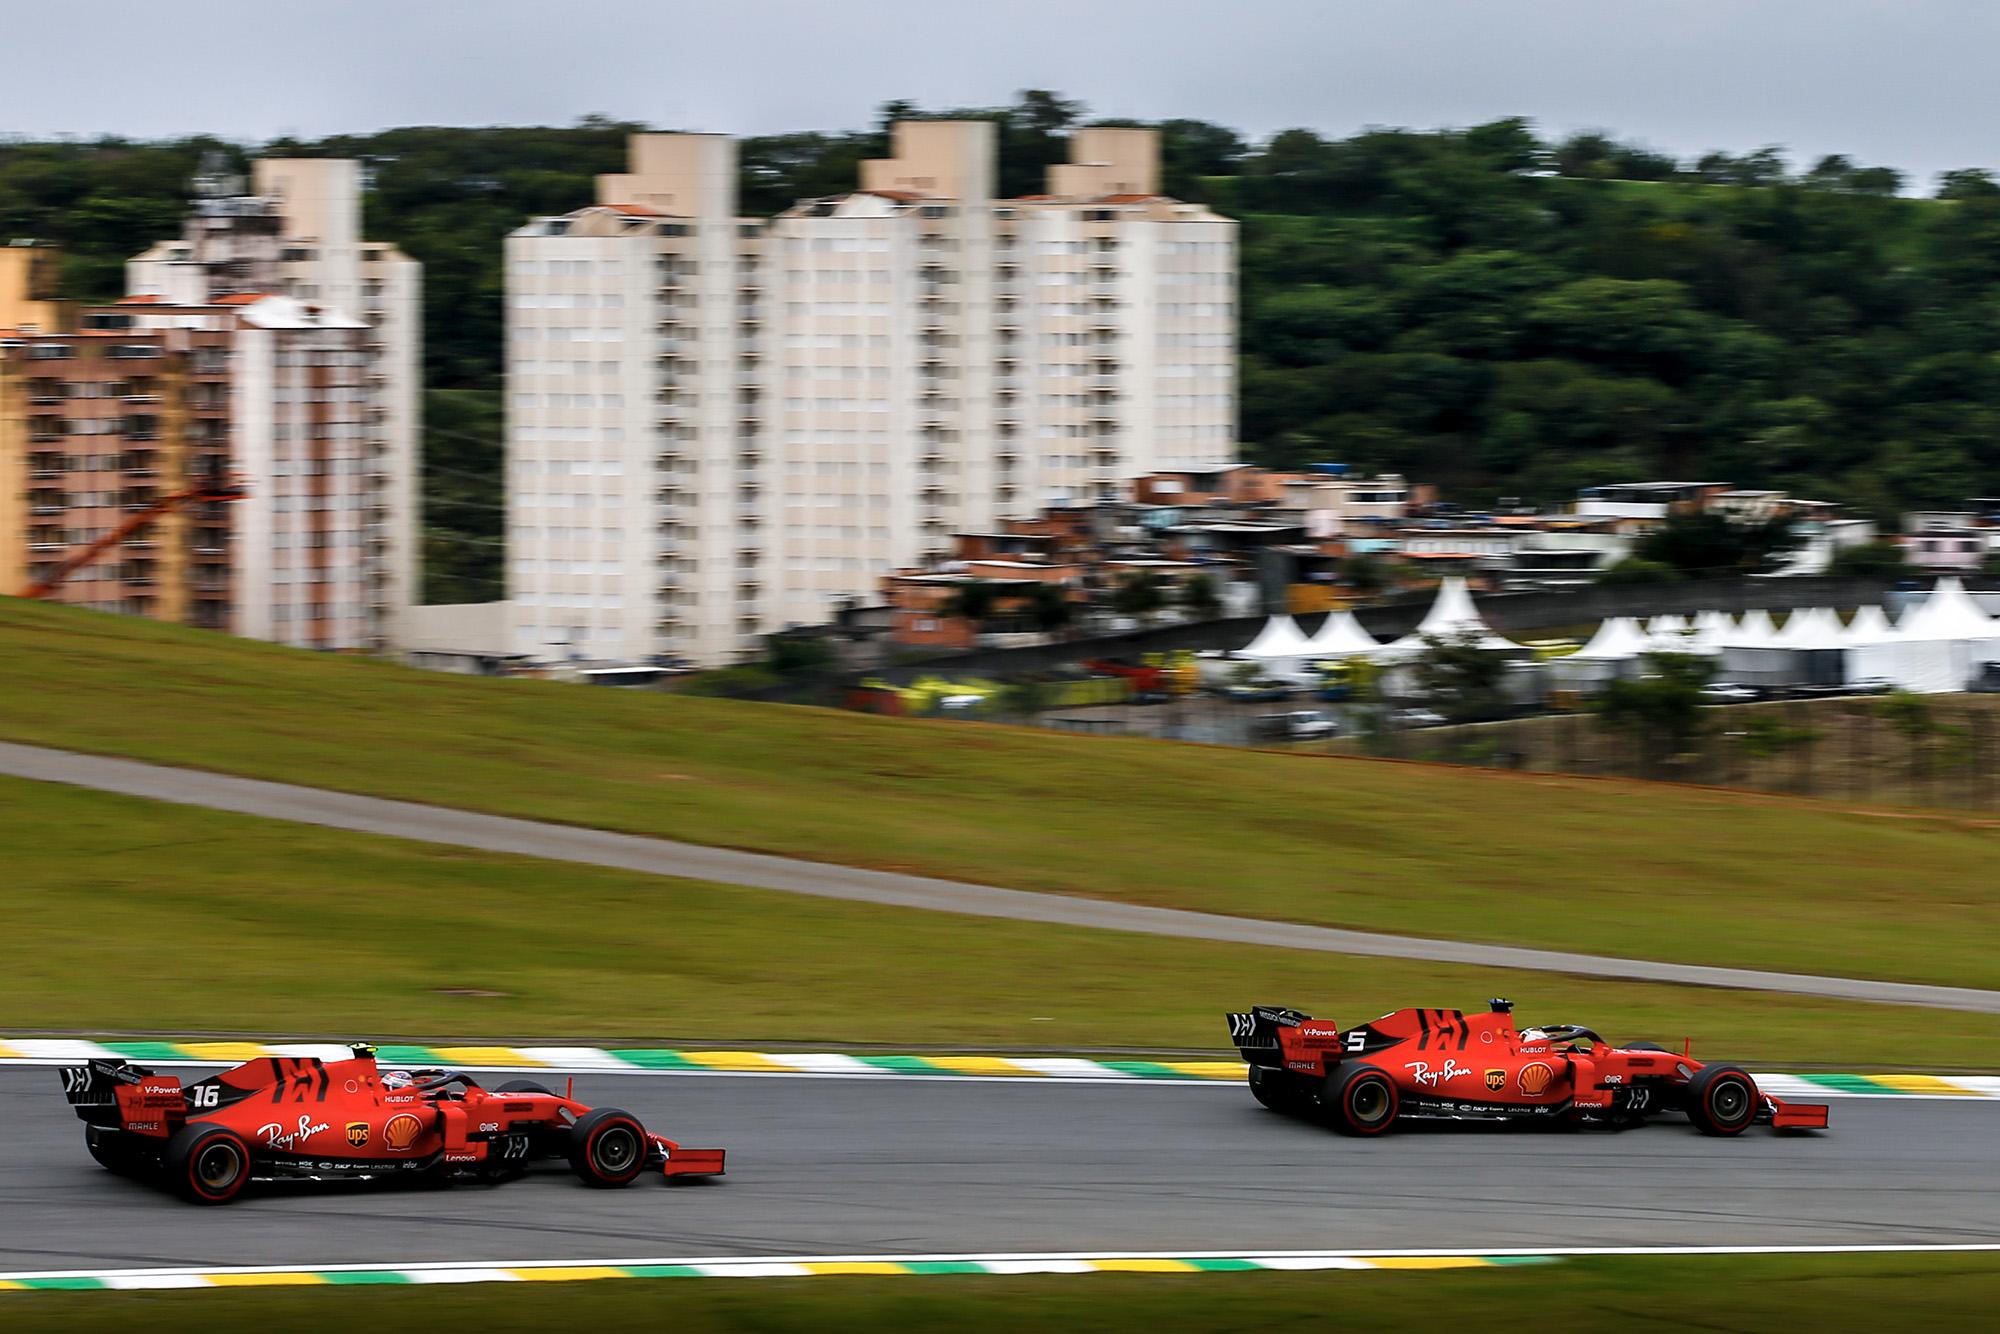 Sebastian Vettel leads Charles Leclerc in qualifying for the 2019 F1 Brazilian Grand Prix